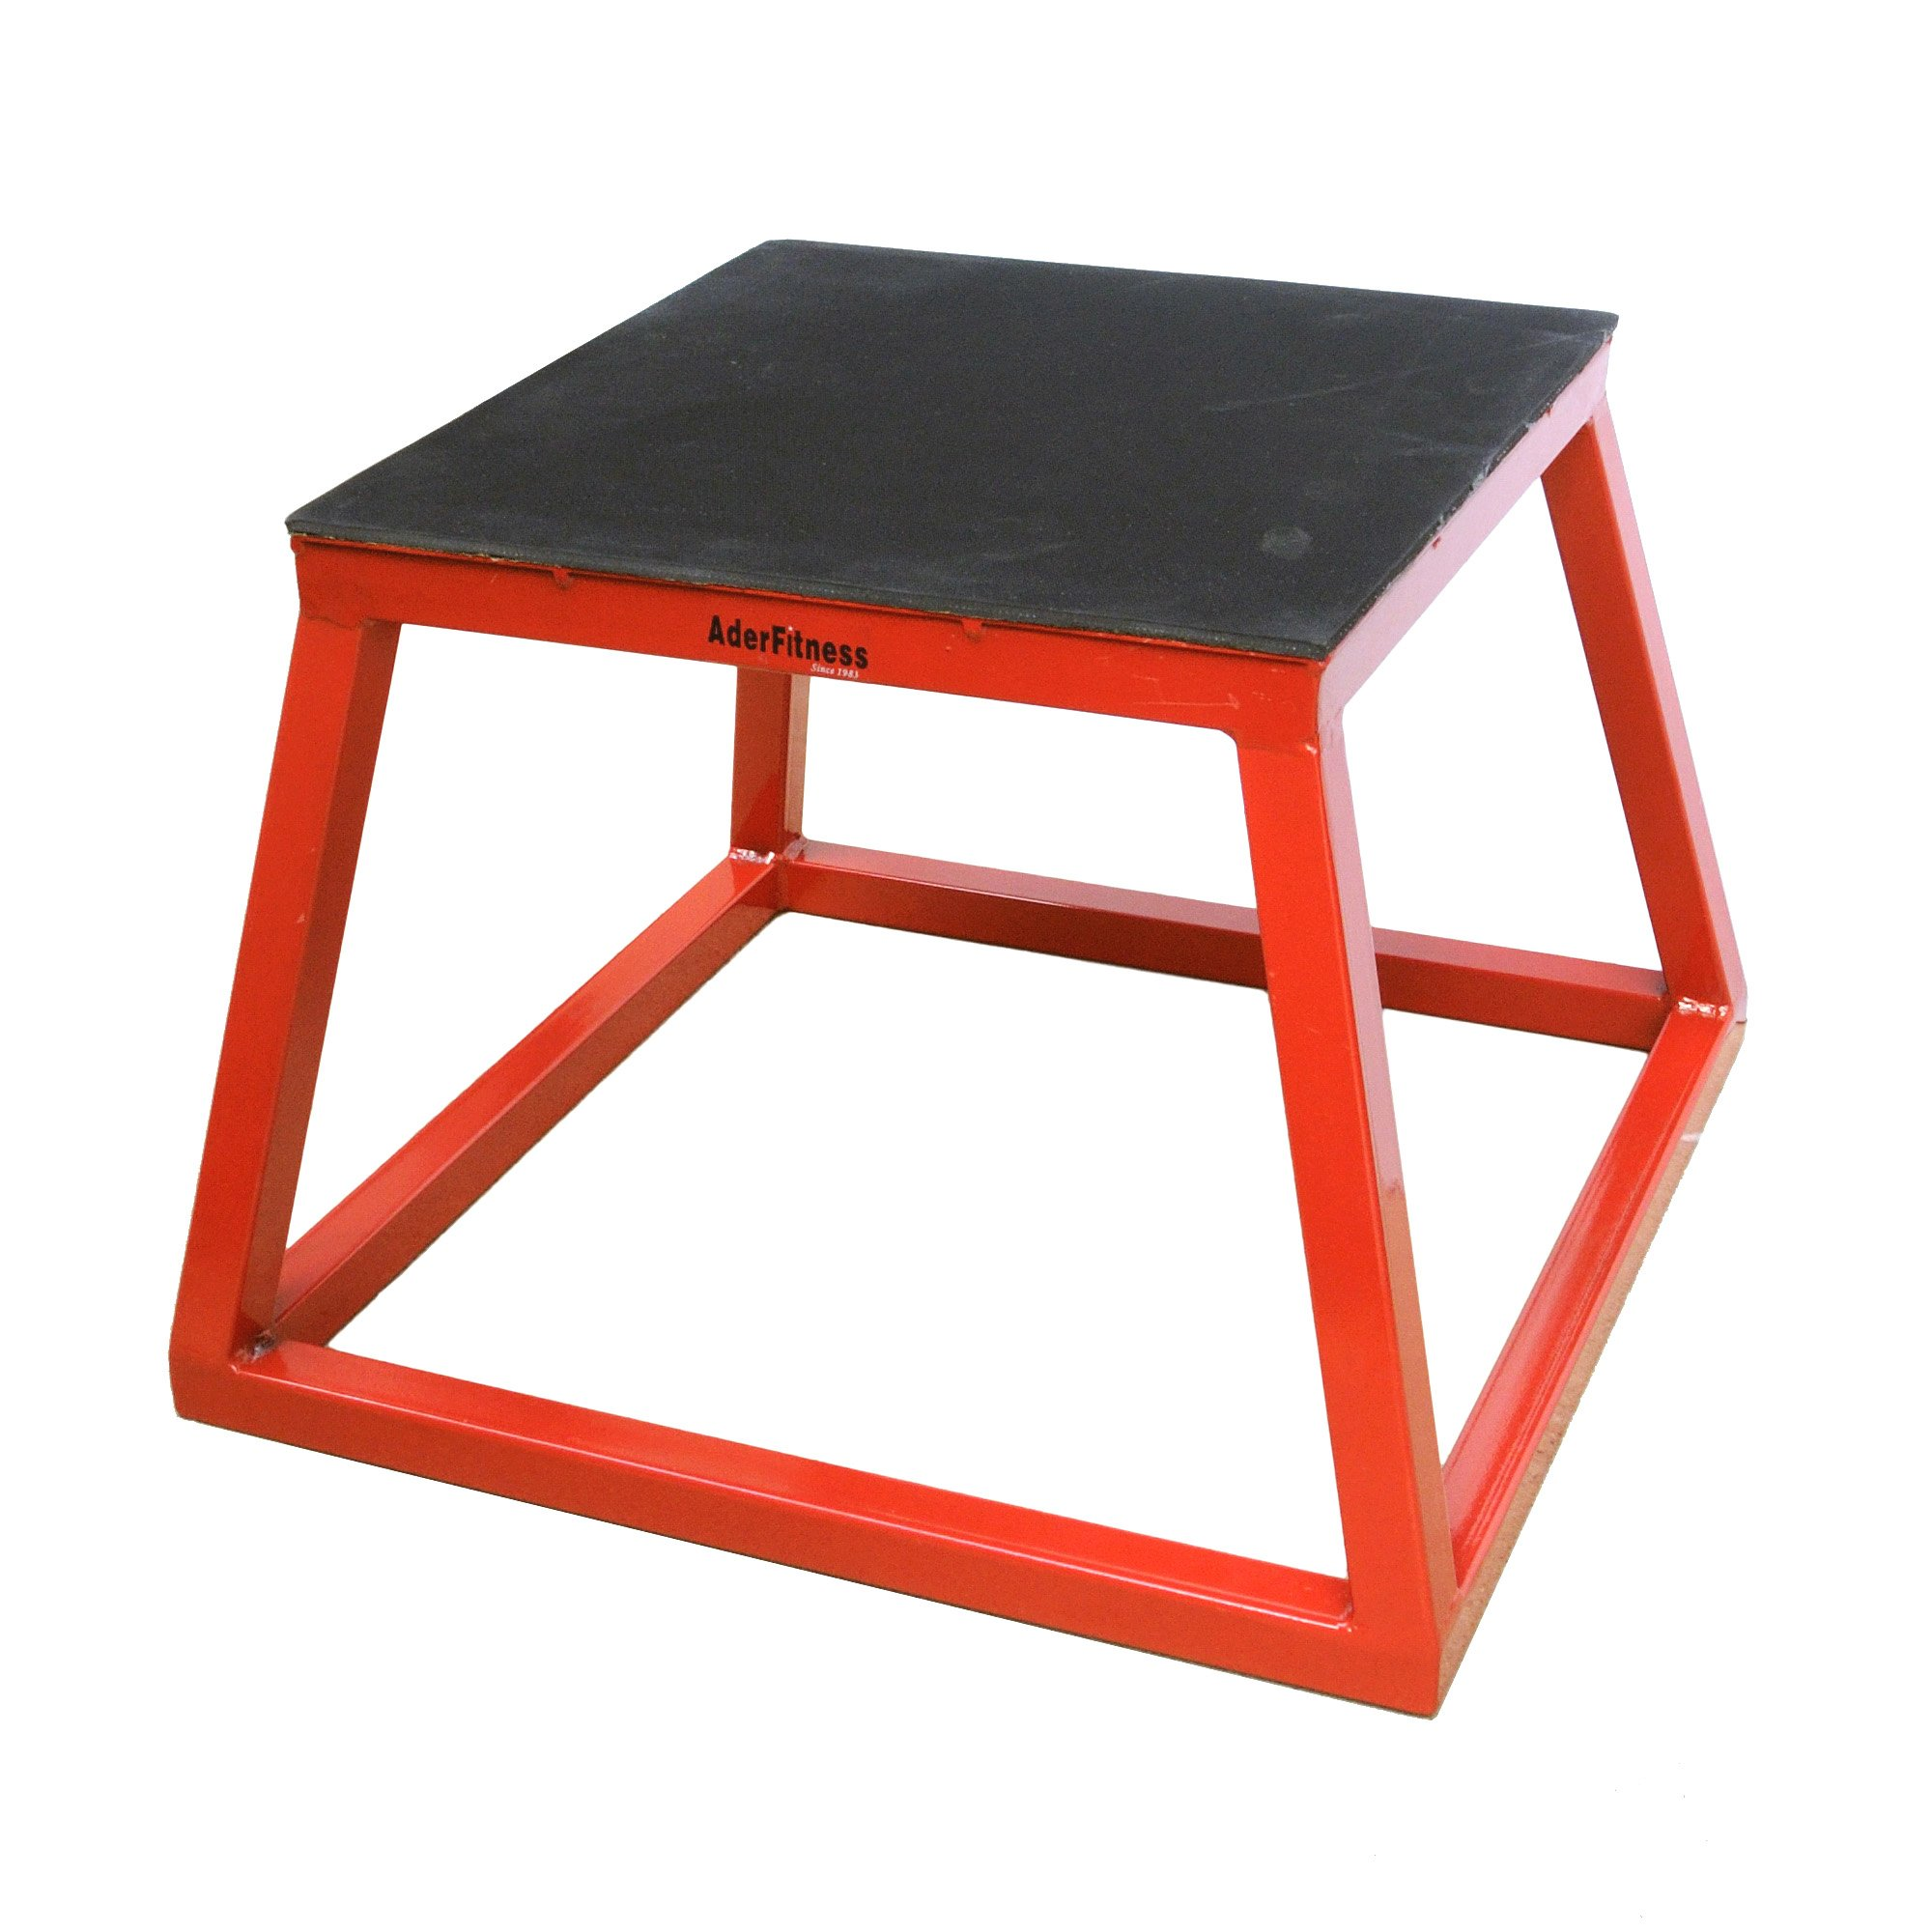 Plyometric Platform Box Set- 12'', 18'' Red